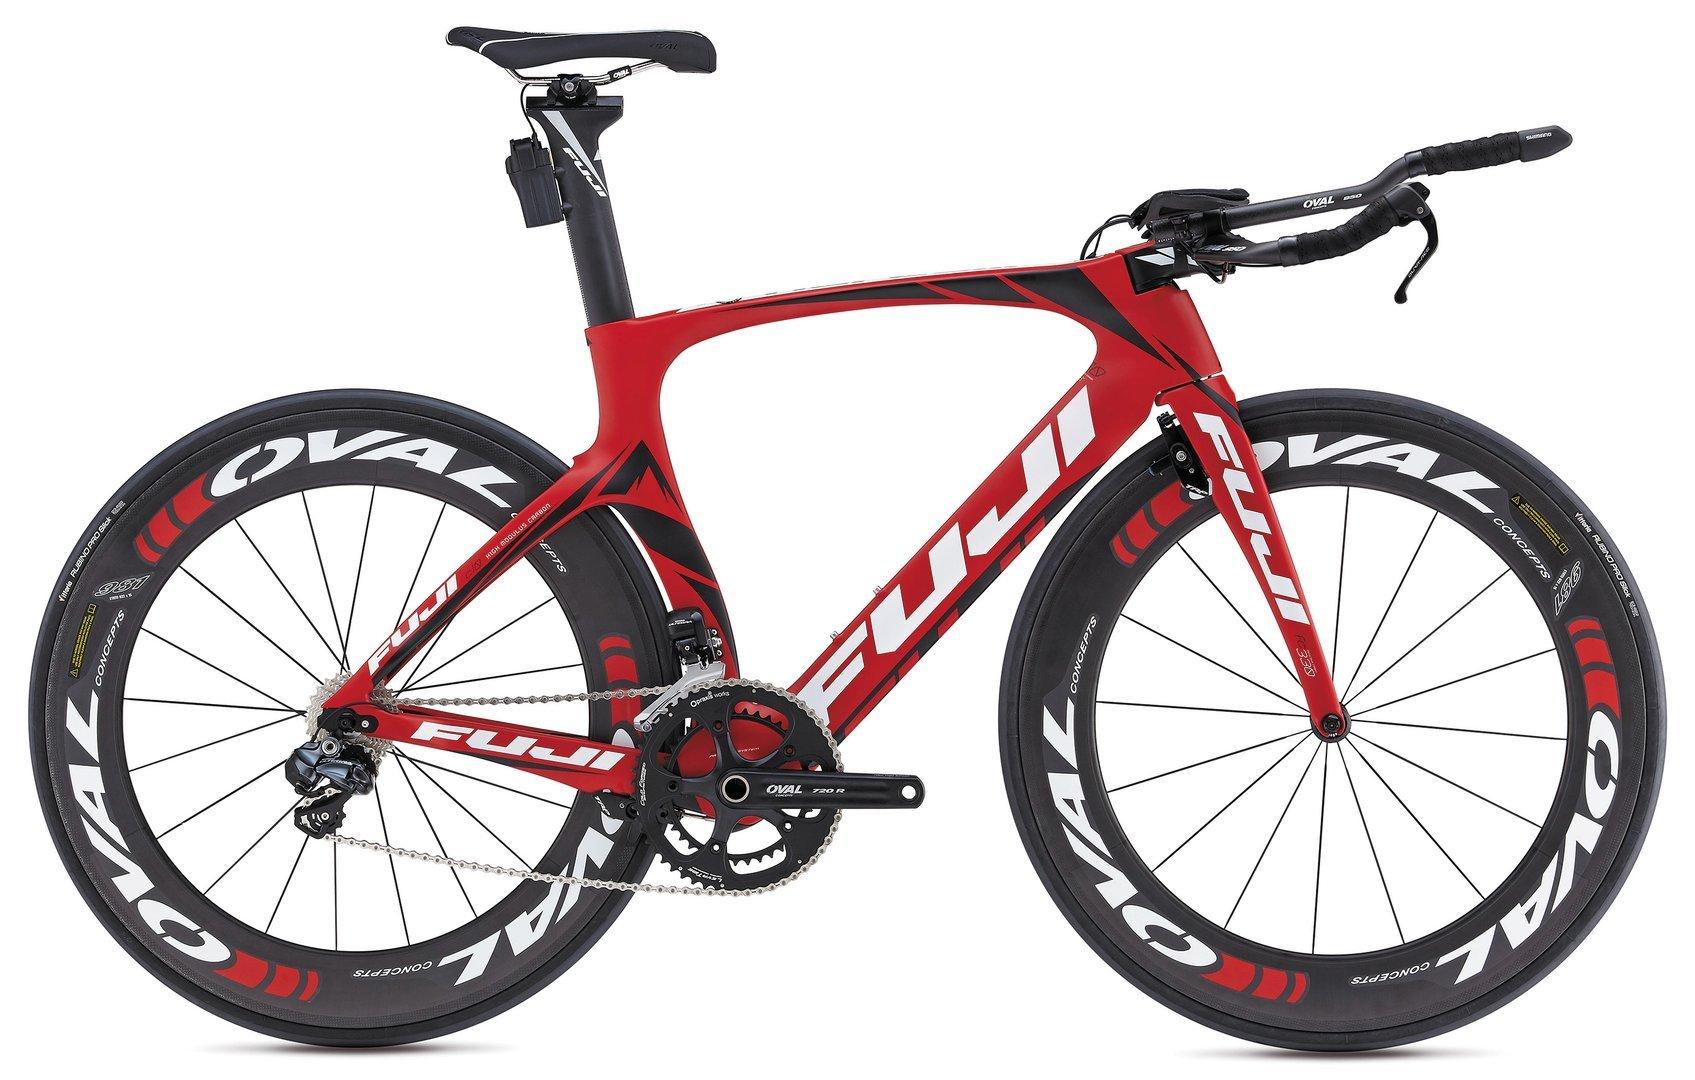 2019 Giant Trinity Advanced Pro 1 Triathlon Bike|Mack